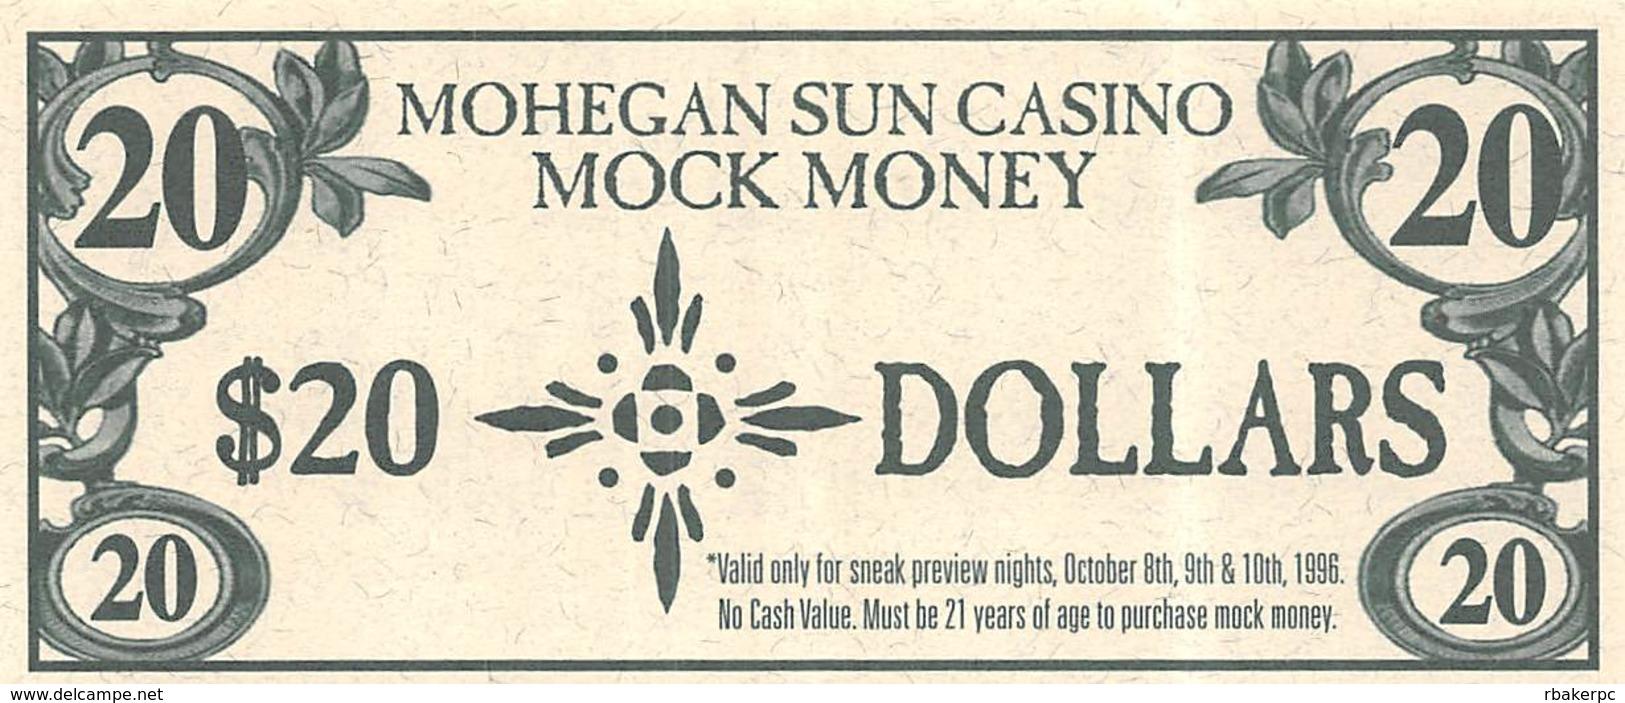 Mohegan Sun Casino - Uncasville, CT USA - $20 Mock Money Bill From Preview Night Oct 8-10, 1996 - Casino Cards